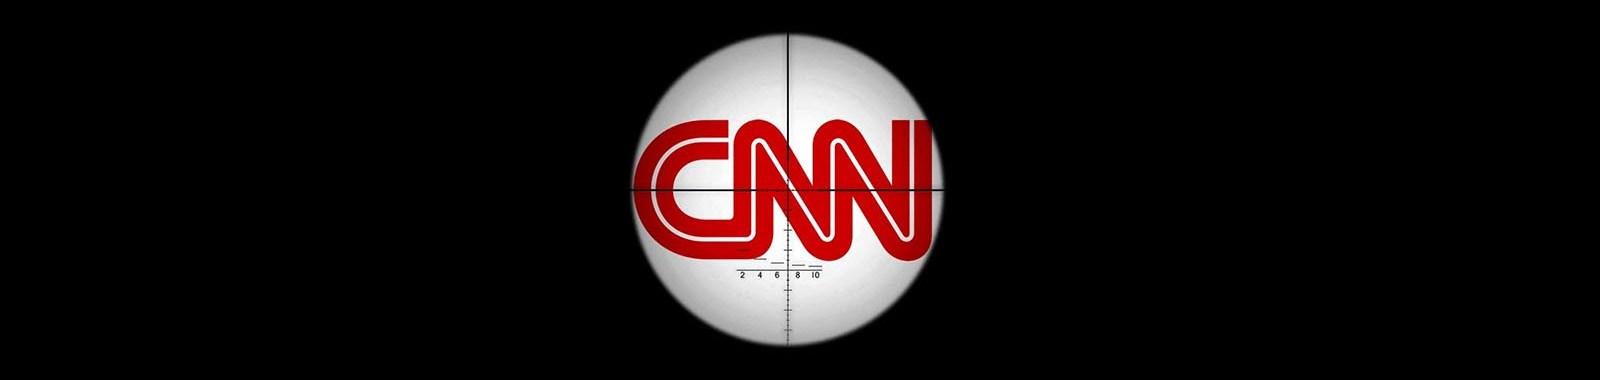 CNN-target-mainer-eye